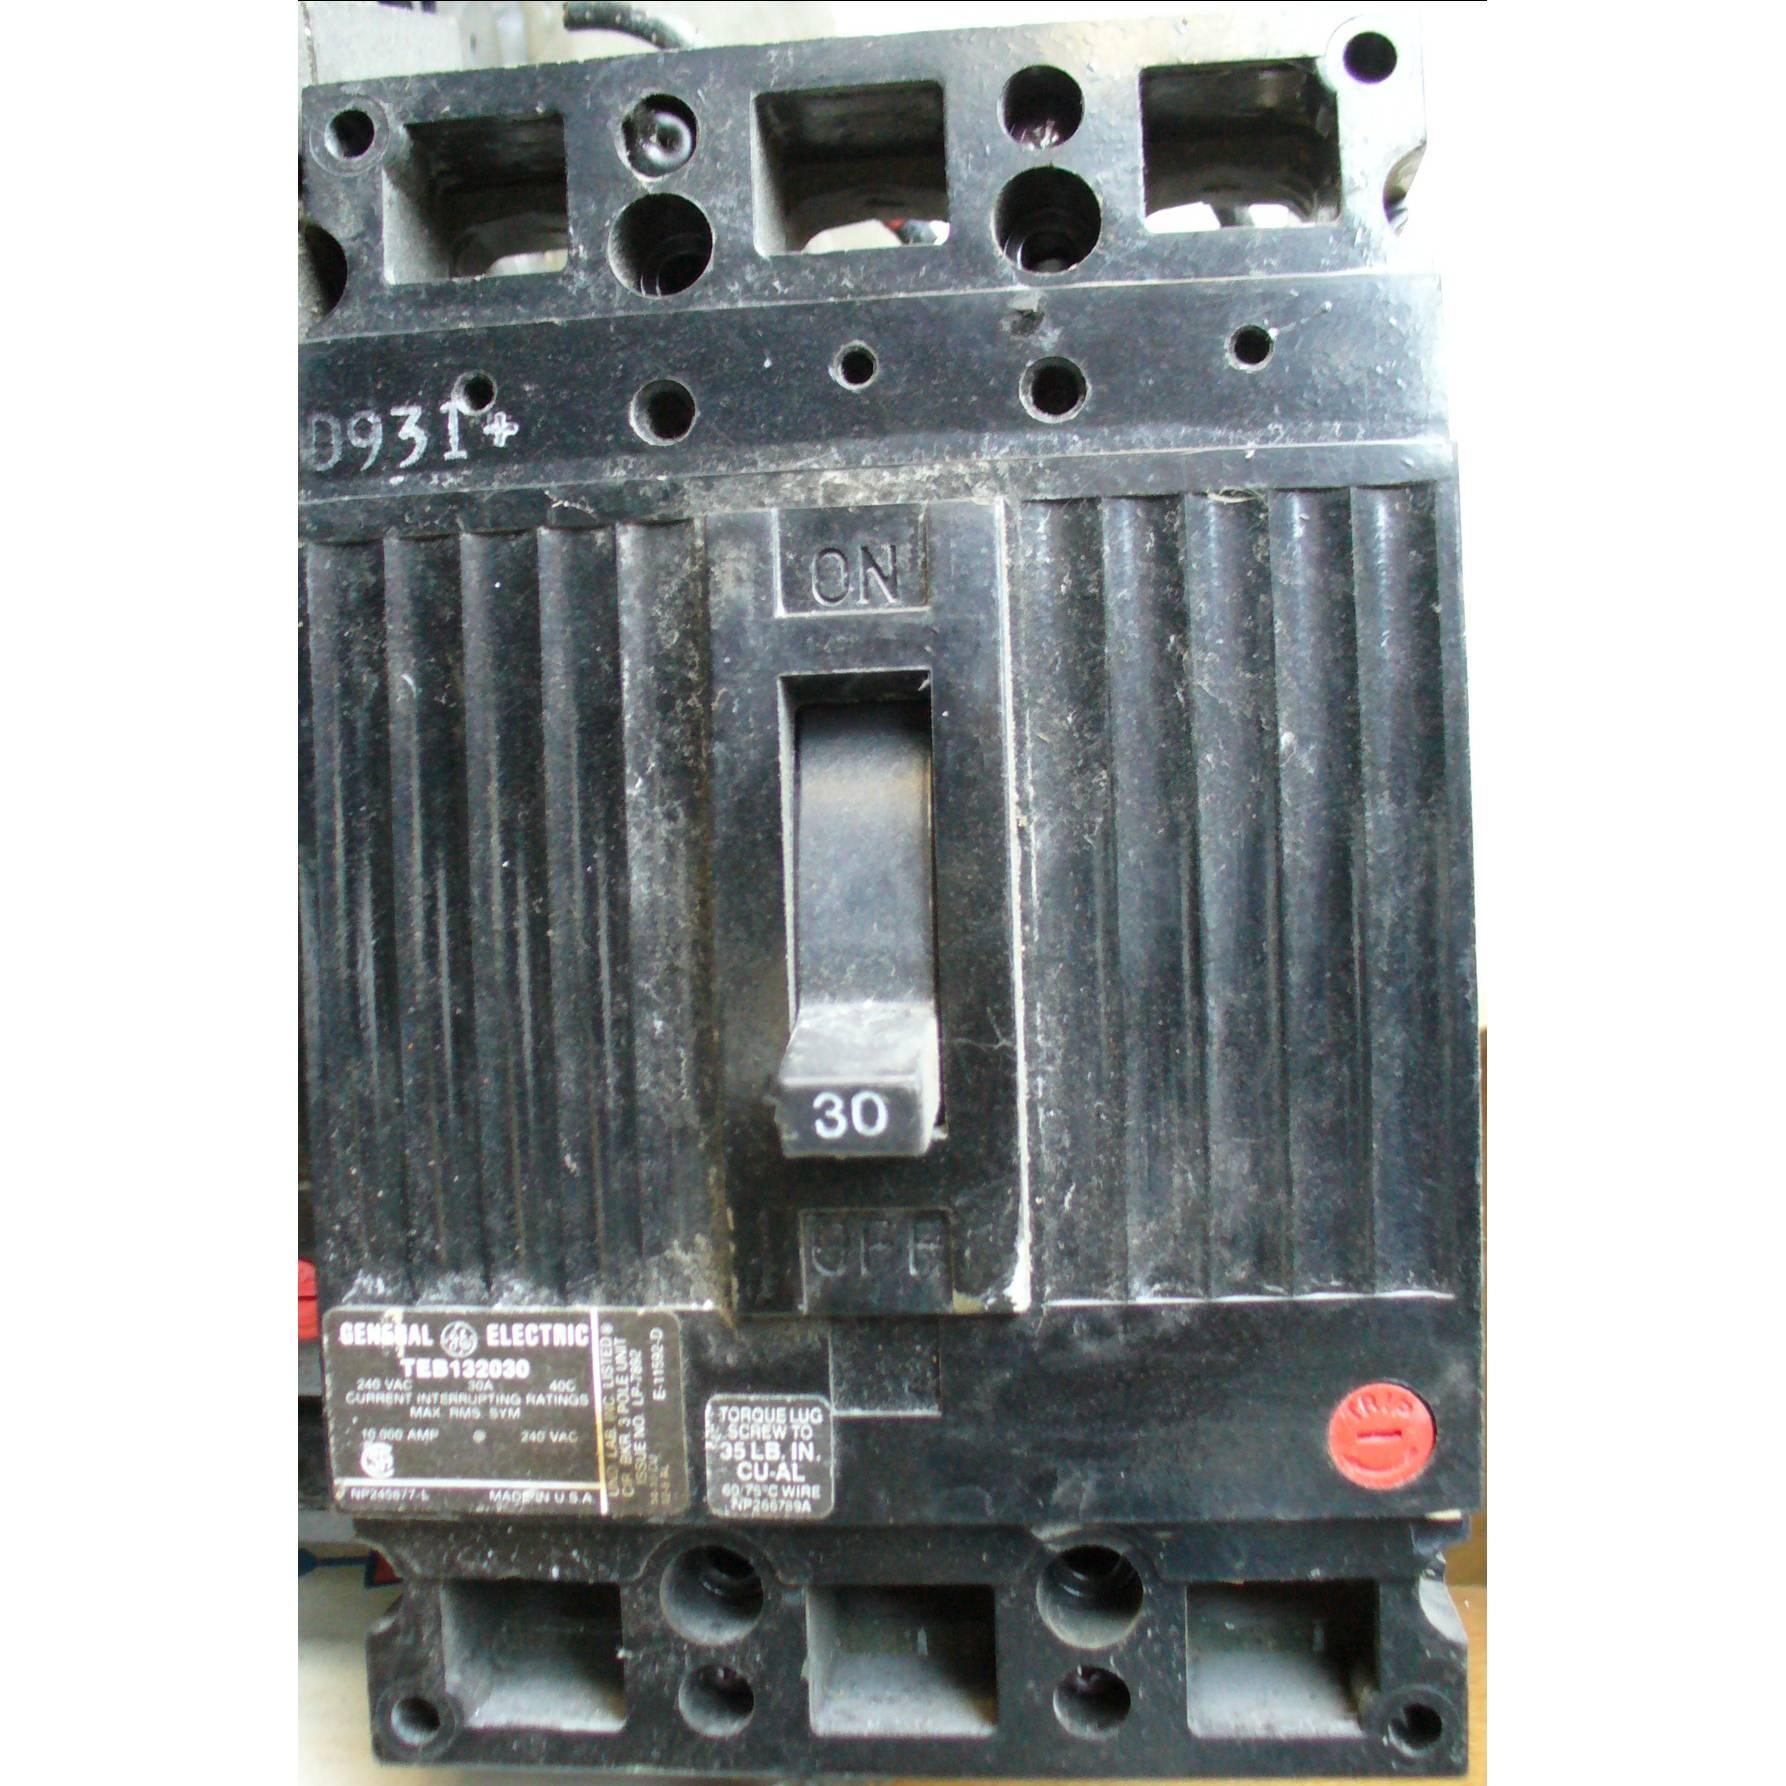 General Electric 30 Amp 240 VAC Molded Case Circuit Breaker TEB132030